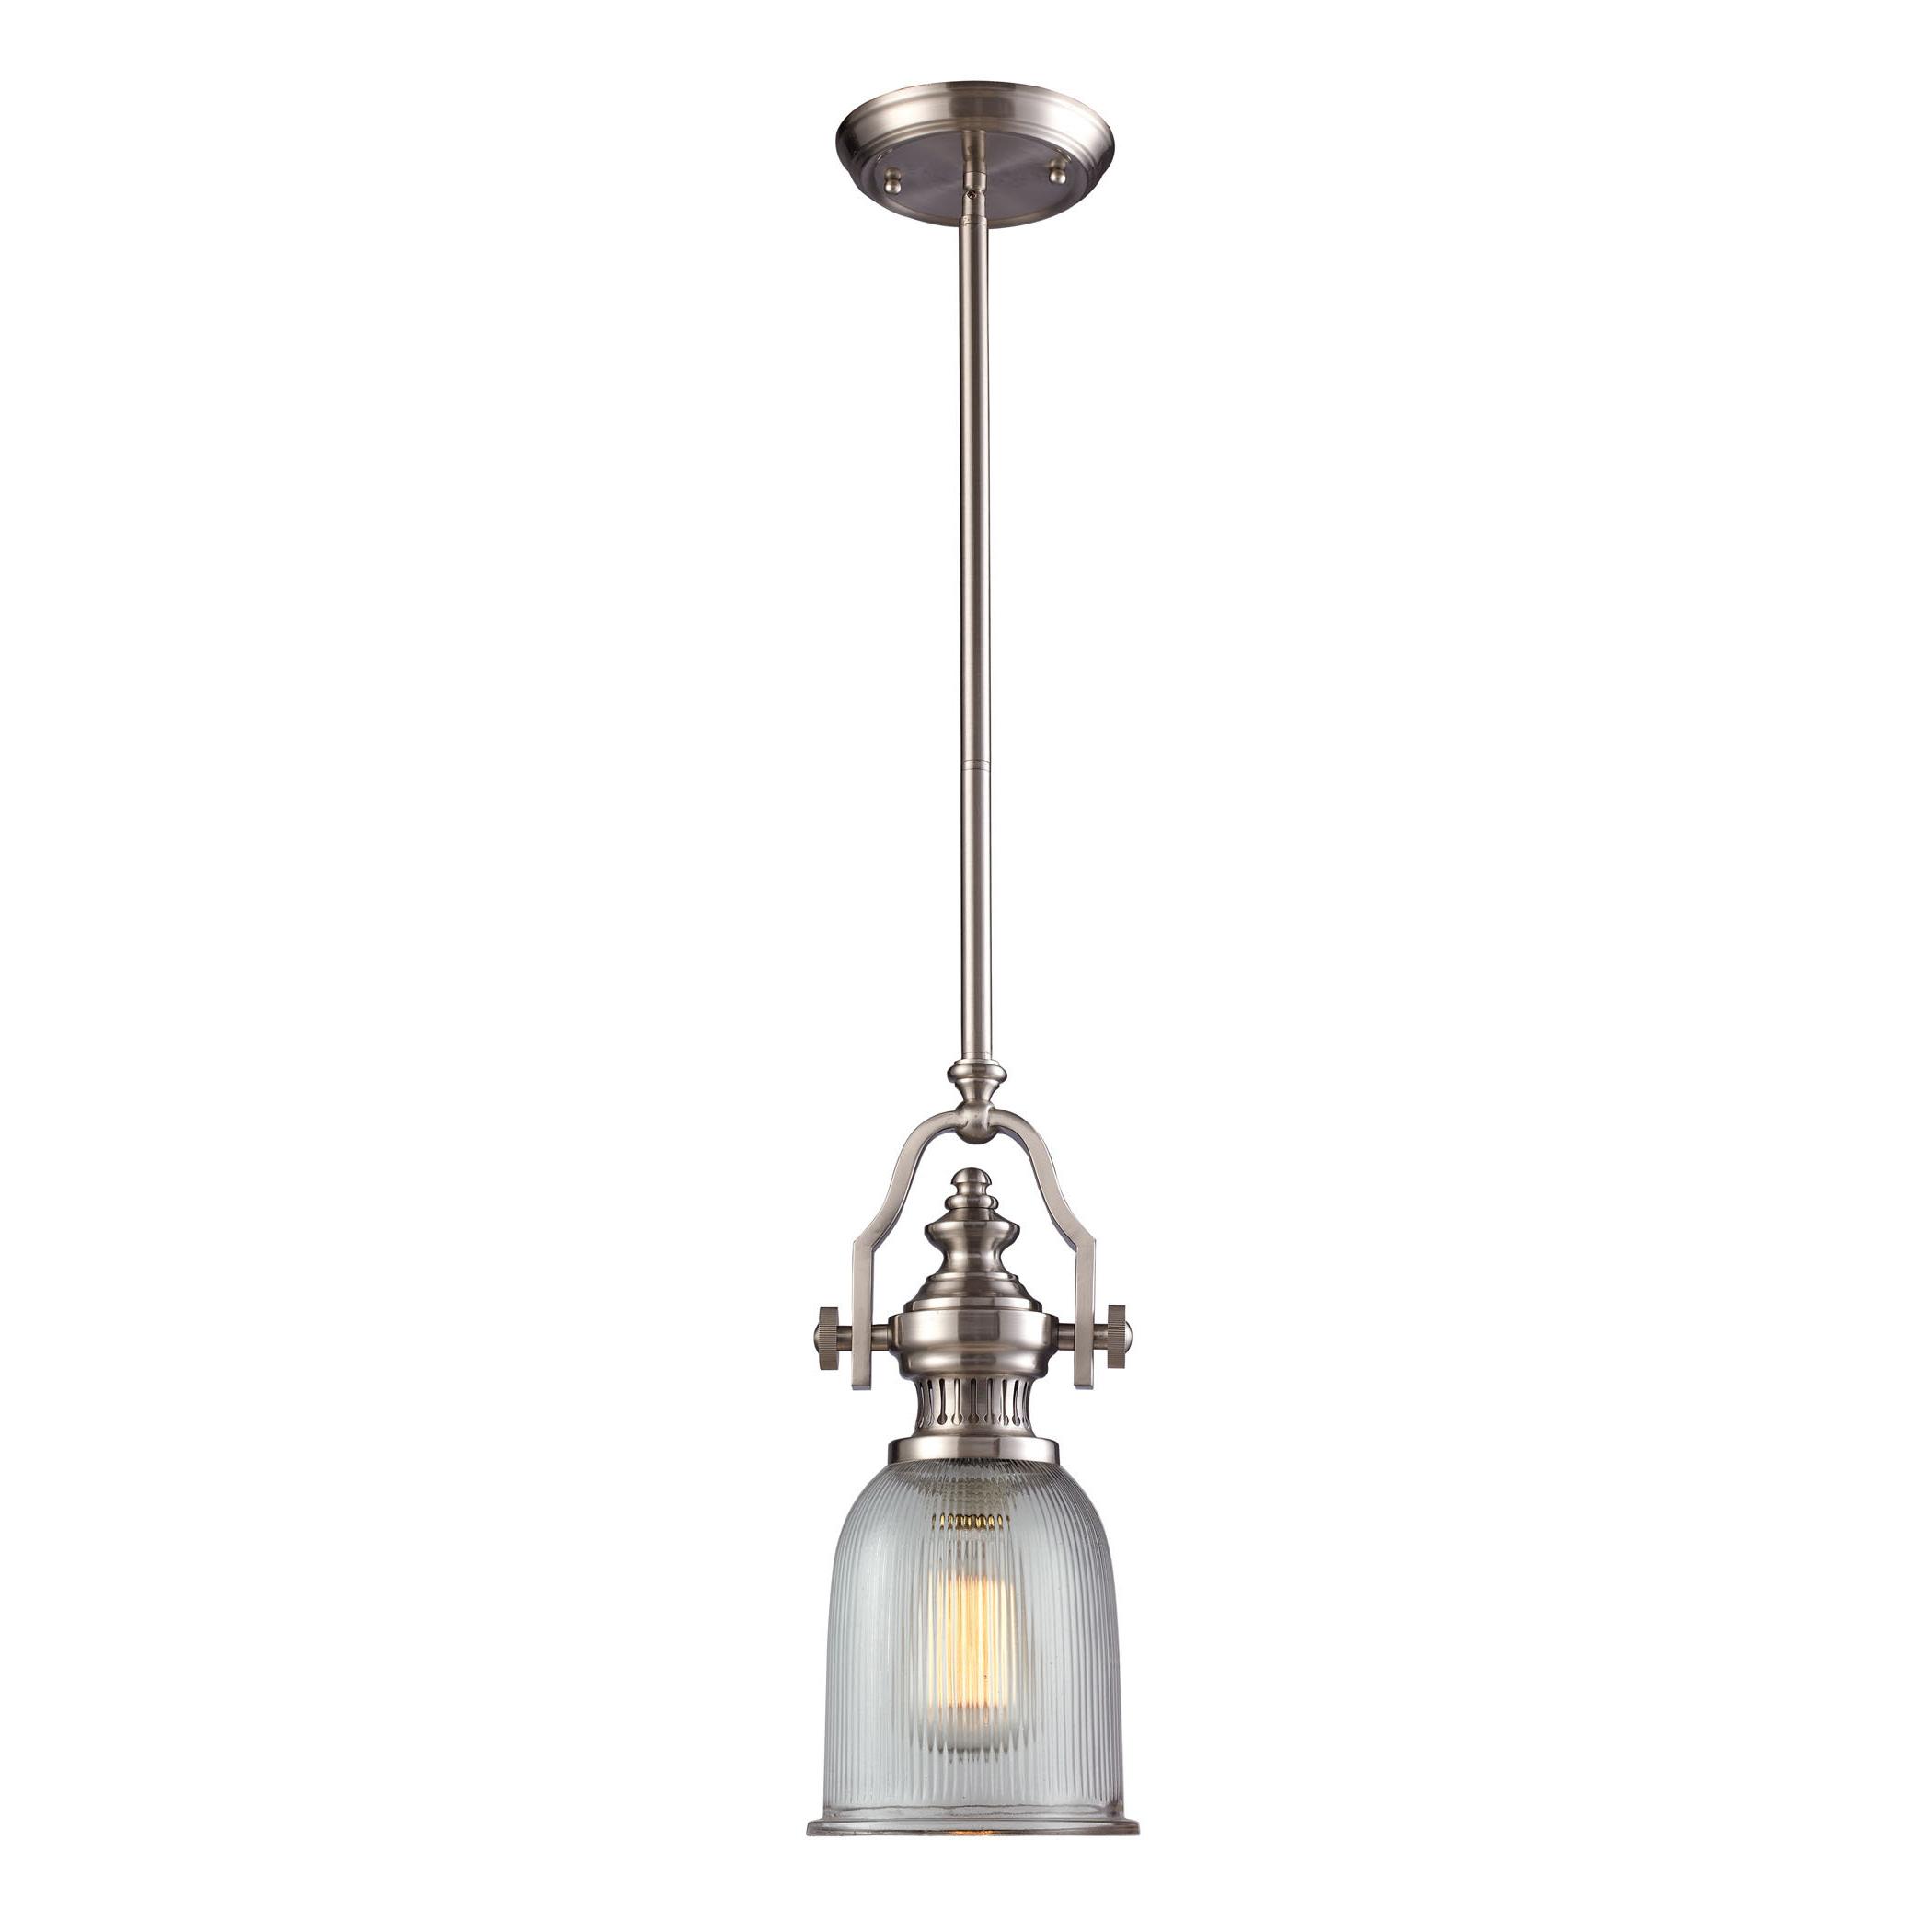 2020 Birch Lane™ Heritage Erico 1 Light Single Bell Pendant With Regard To Carey 1 Light Single Bell Pendants (View 2 of 25)